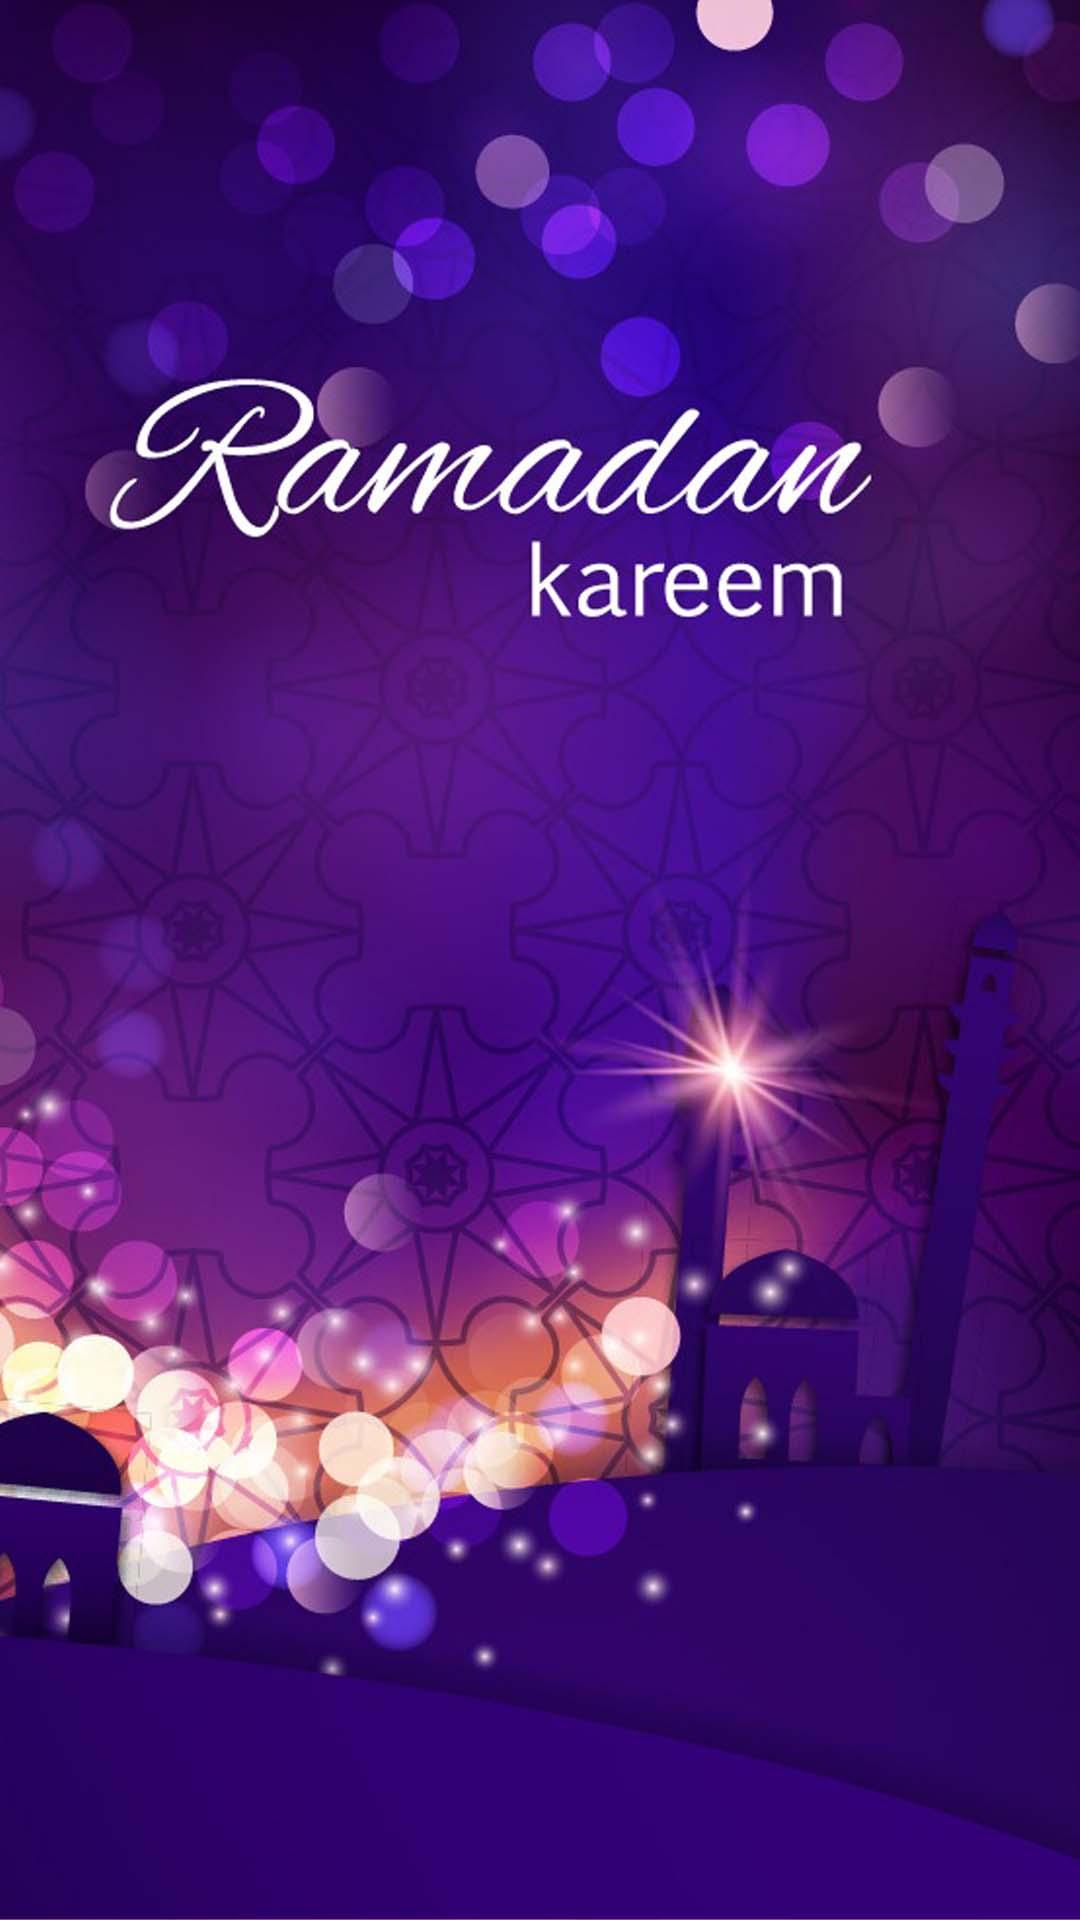 خلفيات موبايل رمضان كريم Mobile Wallpapers HD 13 خلفيات موبايل رمضان كريم Mobile Wallpapers HD